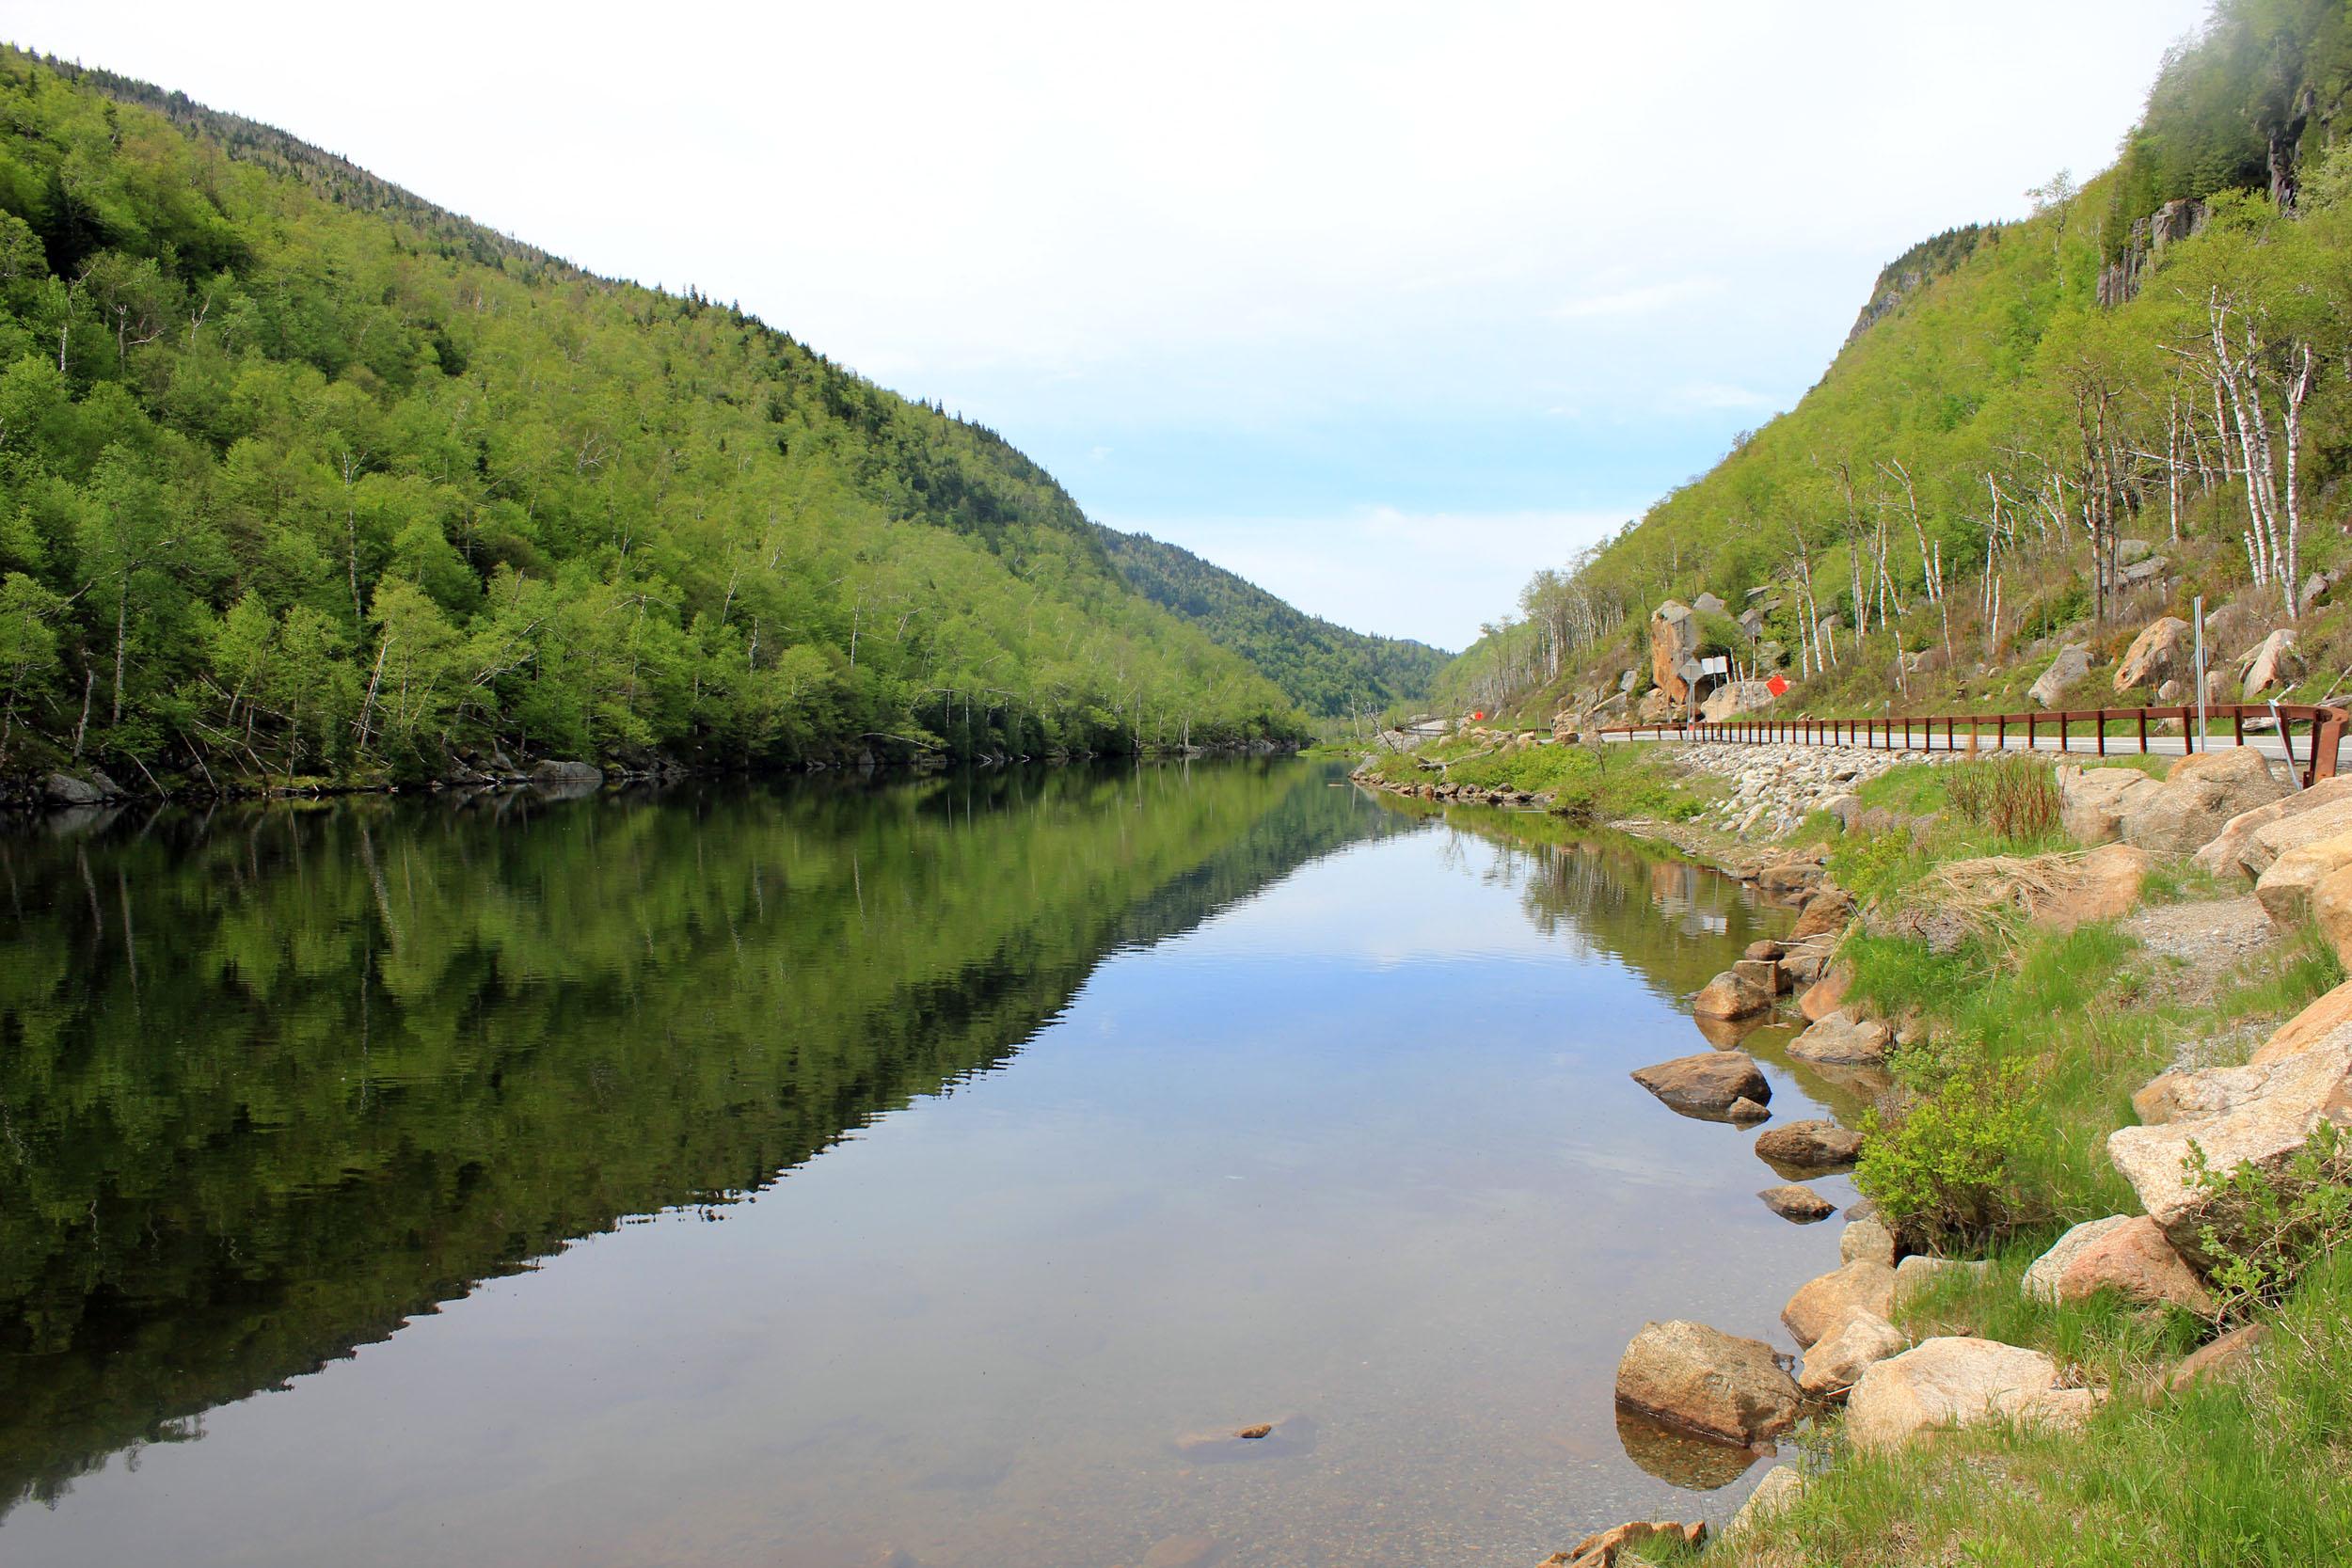 Lake adirondack photo